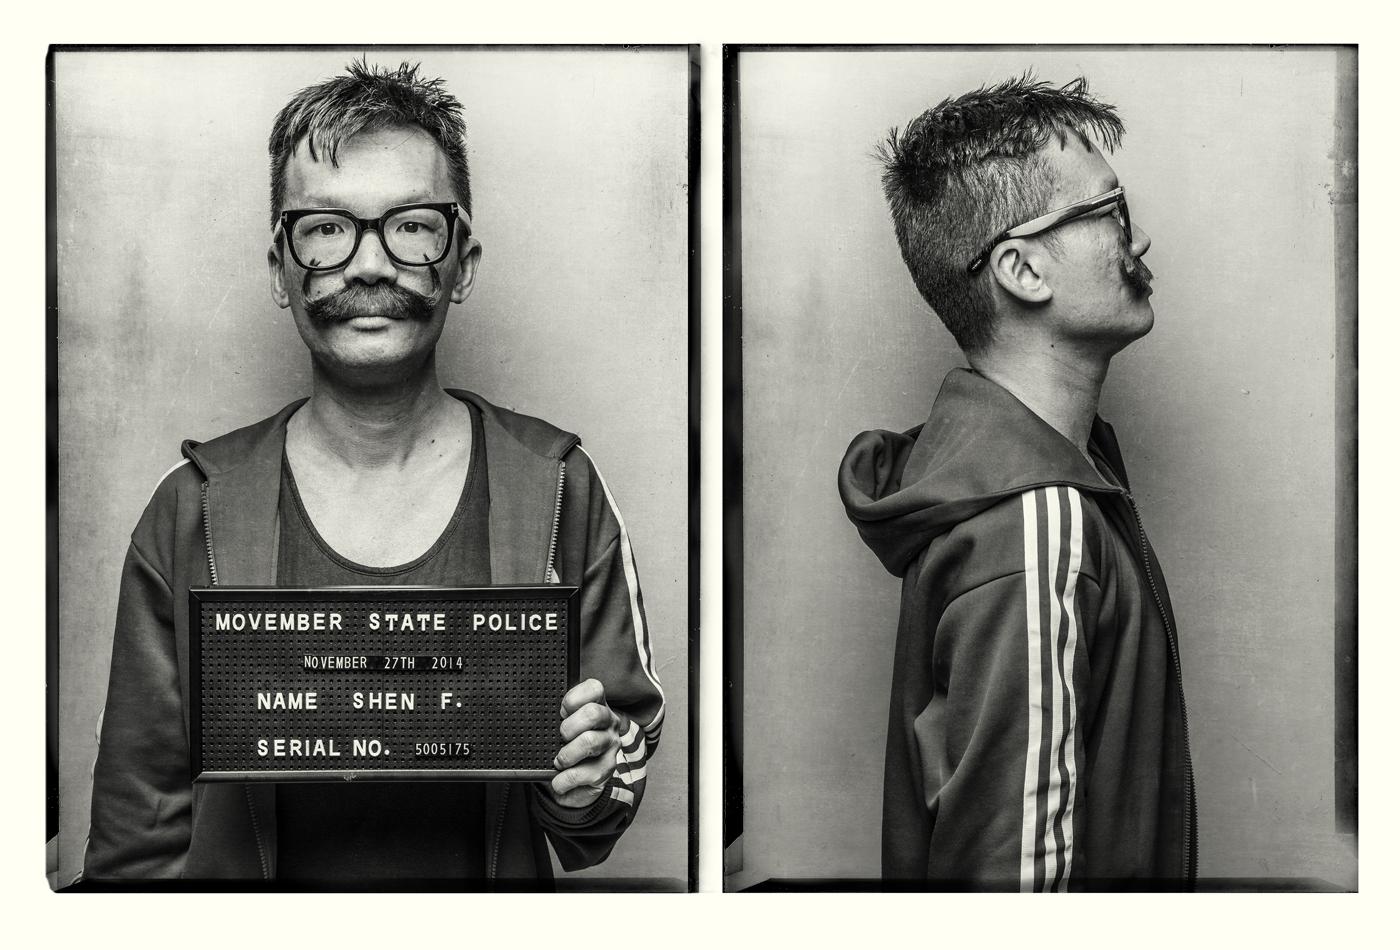 Movember-moustache-mugshots-BLUE5174a